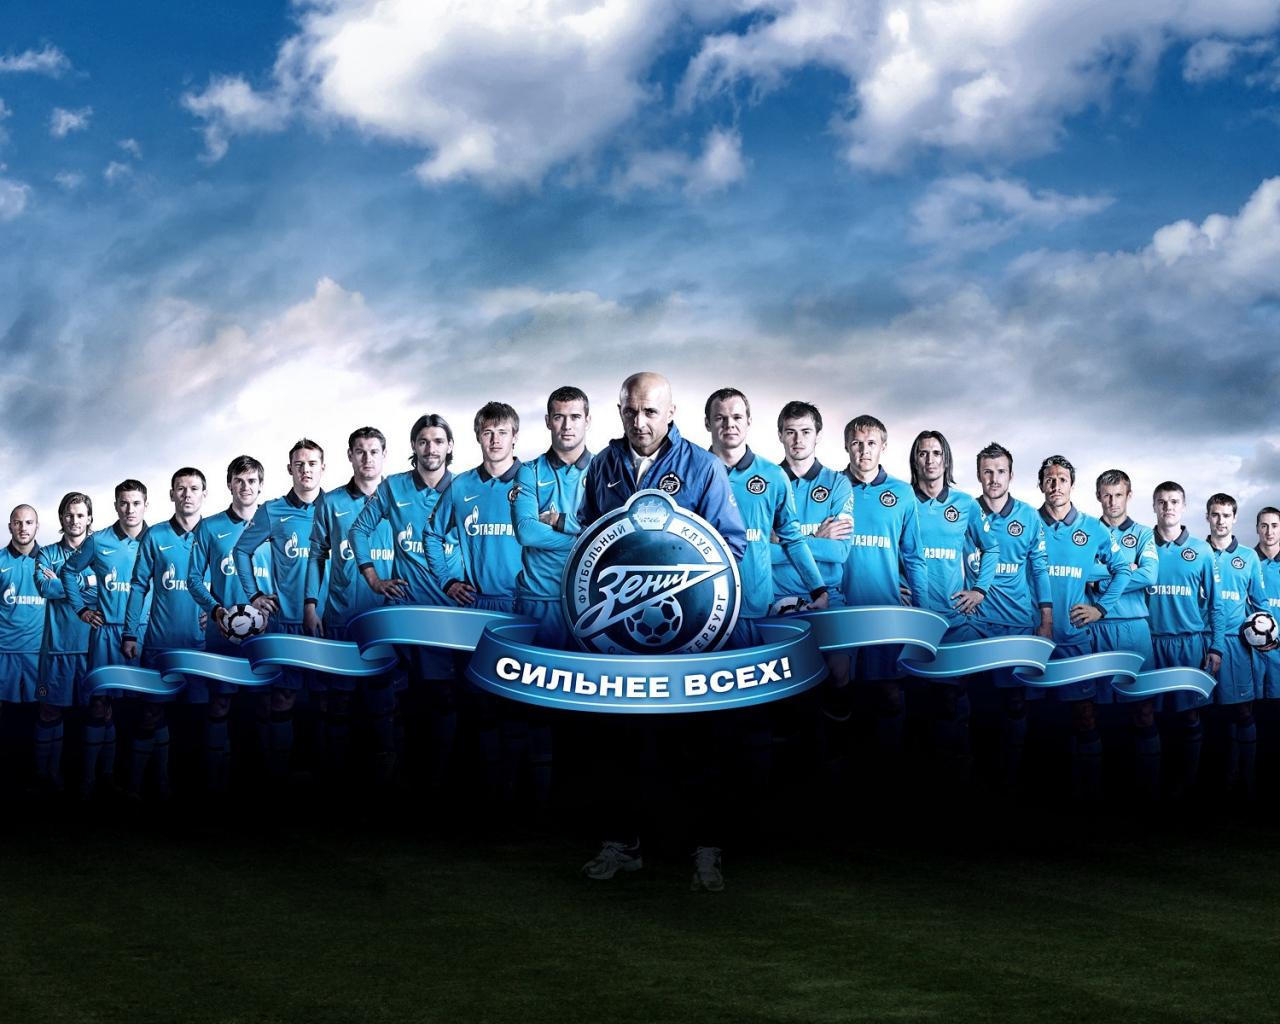 1280x1024 Wallpaper zenith team football sky clouds football club 1280x1024